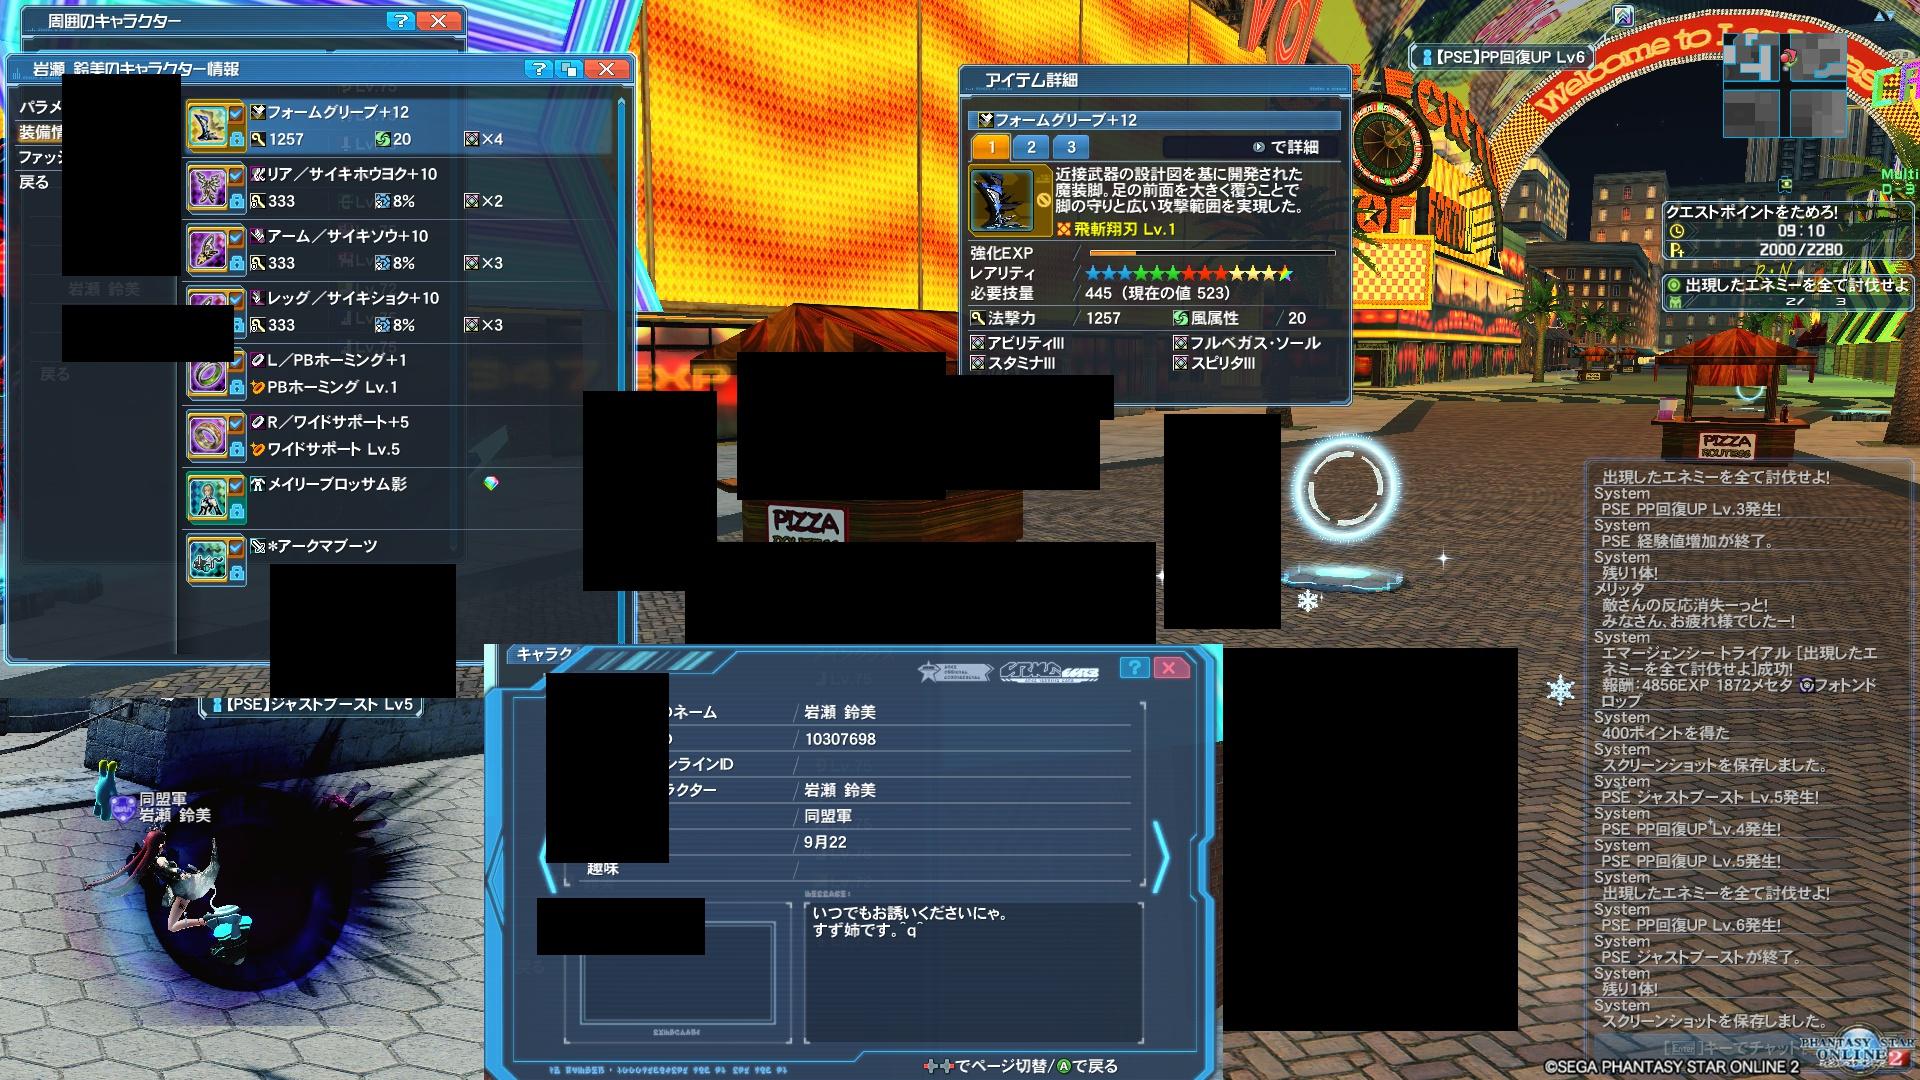 【PSO2】PHANTASY STAR ONLINE2 4鯖晒しスレPart33 [無断転載禁止]©2ch.net->画像>95枚